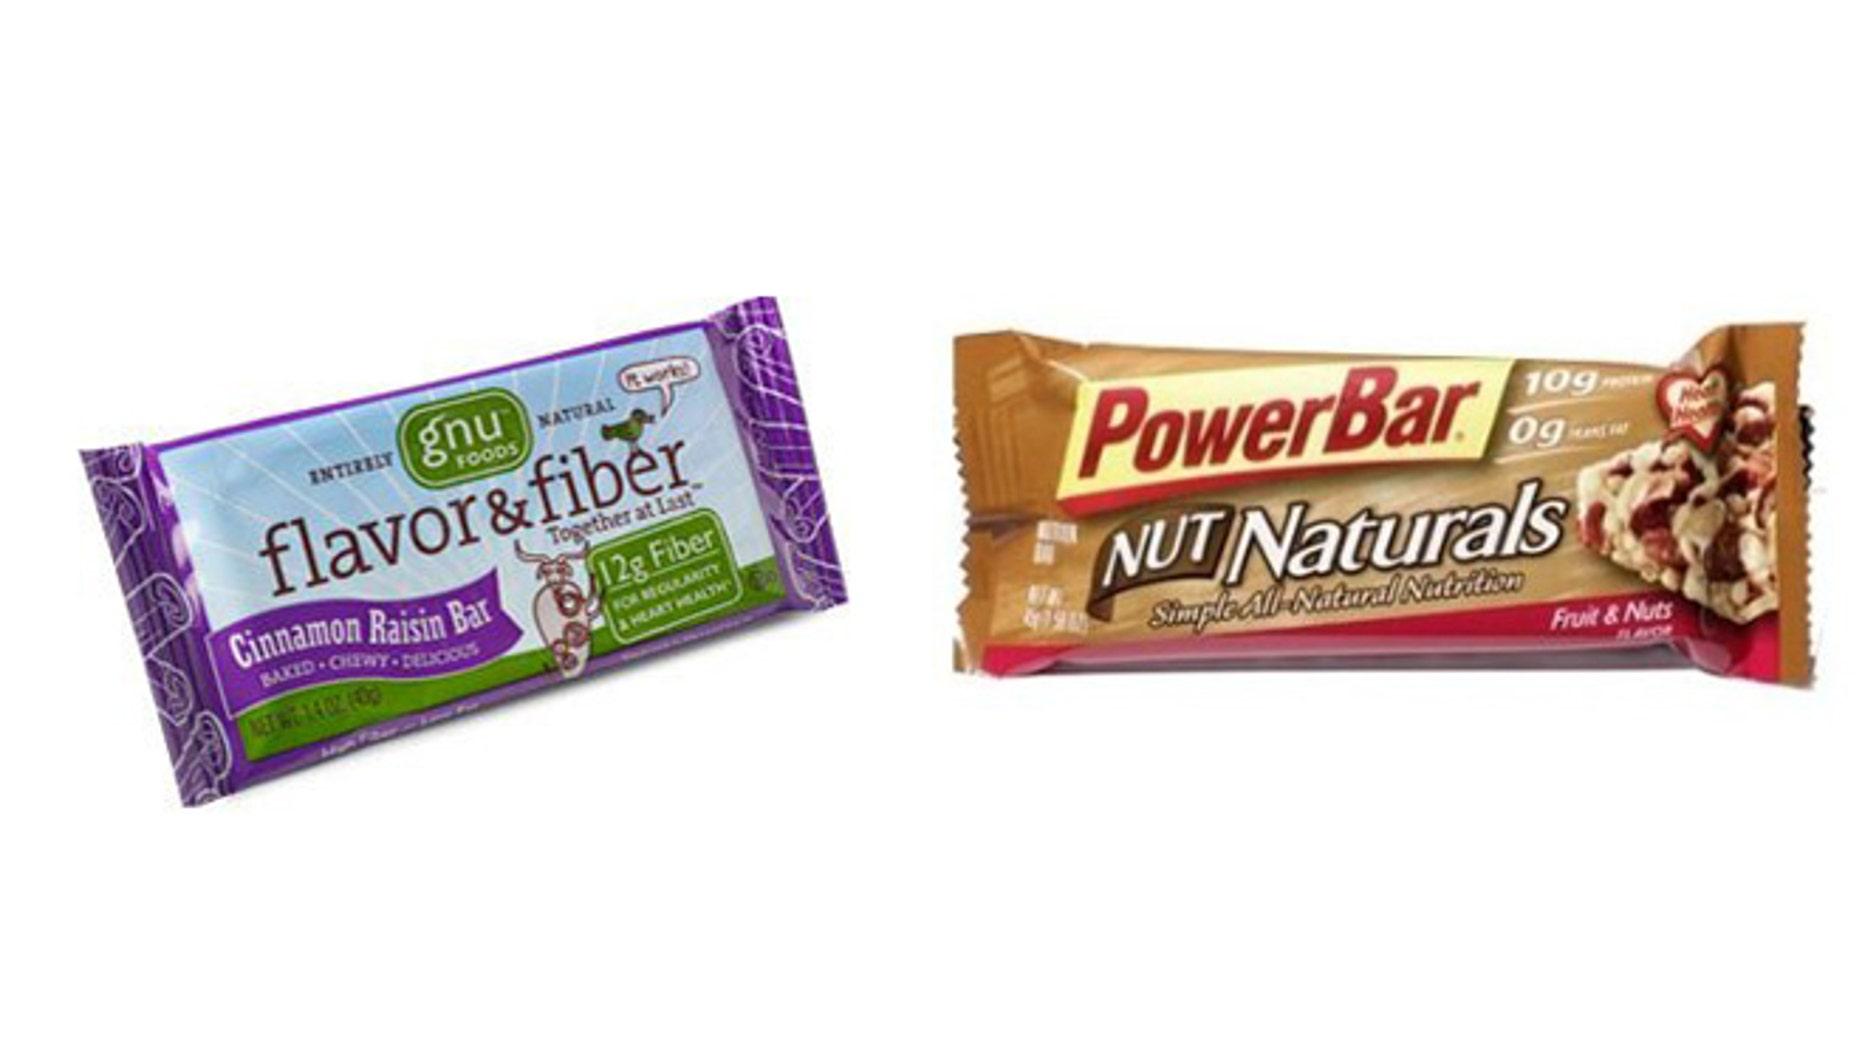 Gnu Foods Flavor & Fiber Cinnamon Raisin and Powerbar Nut Naturals Fruit & Nuts